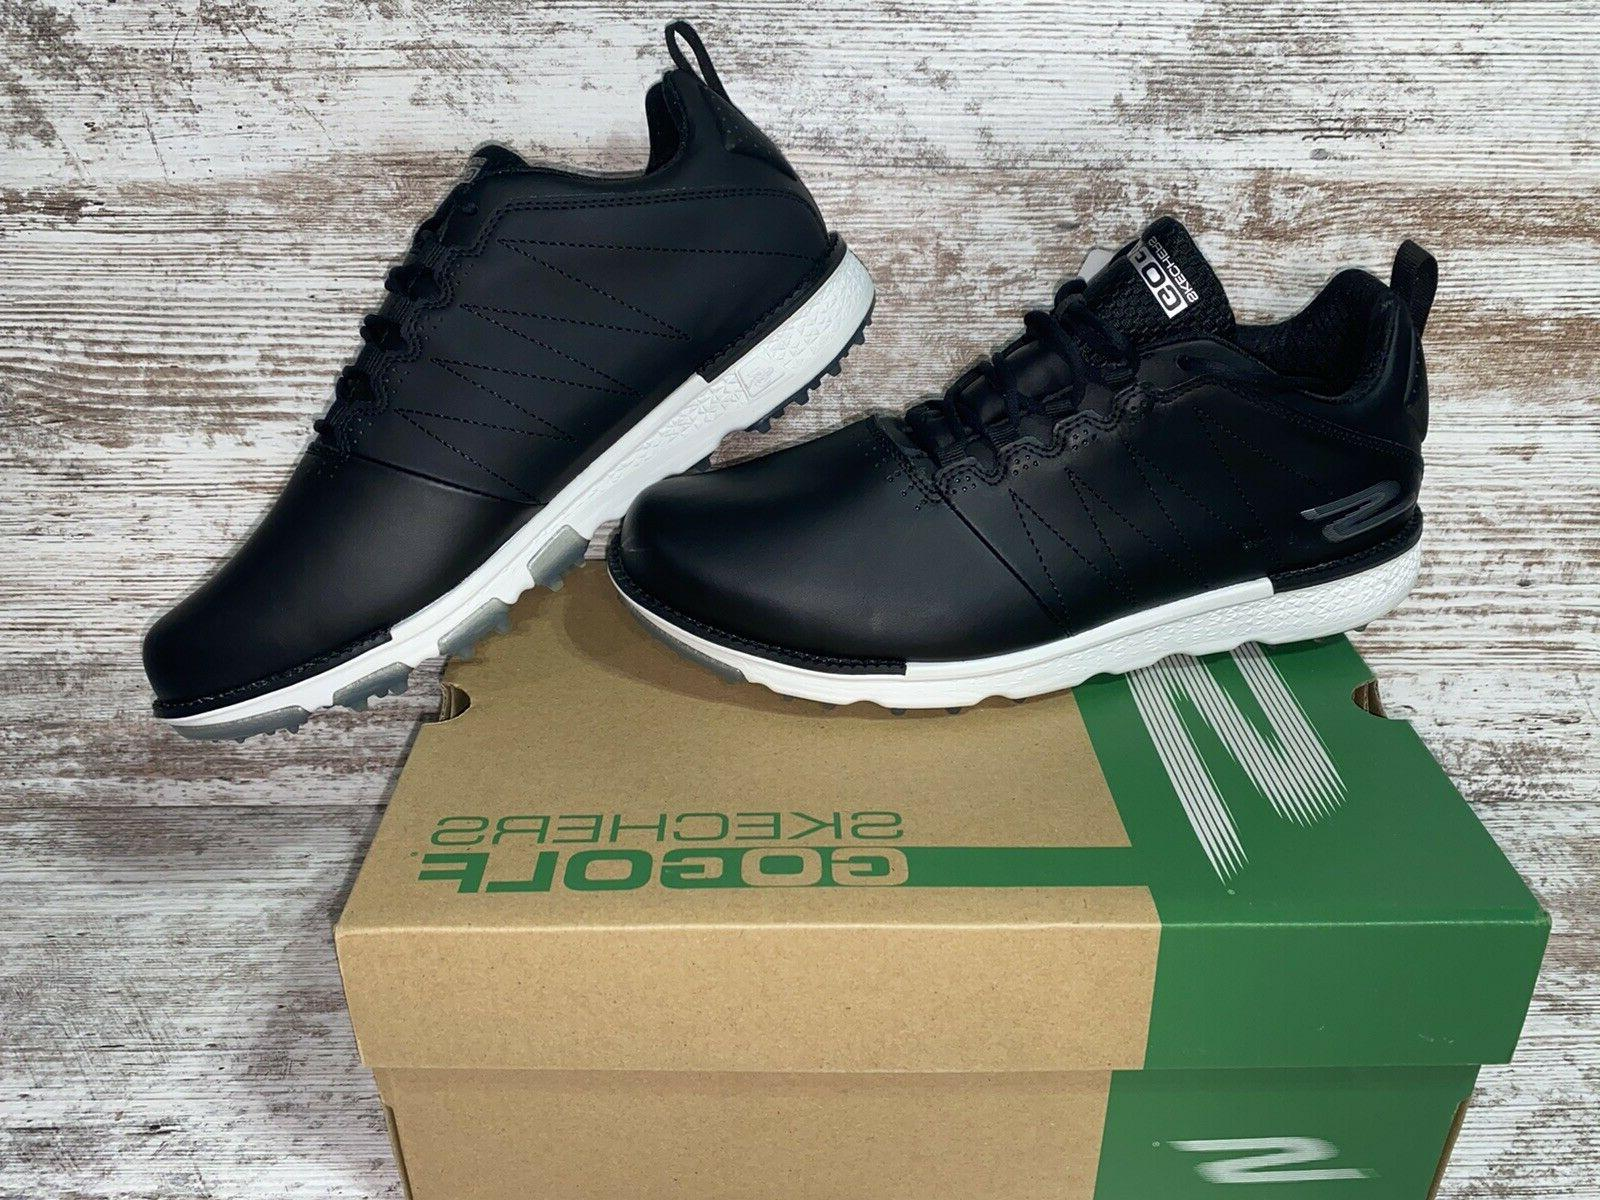 NEW Elite V3 Spikeless Golf Shoes Color Width